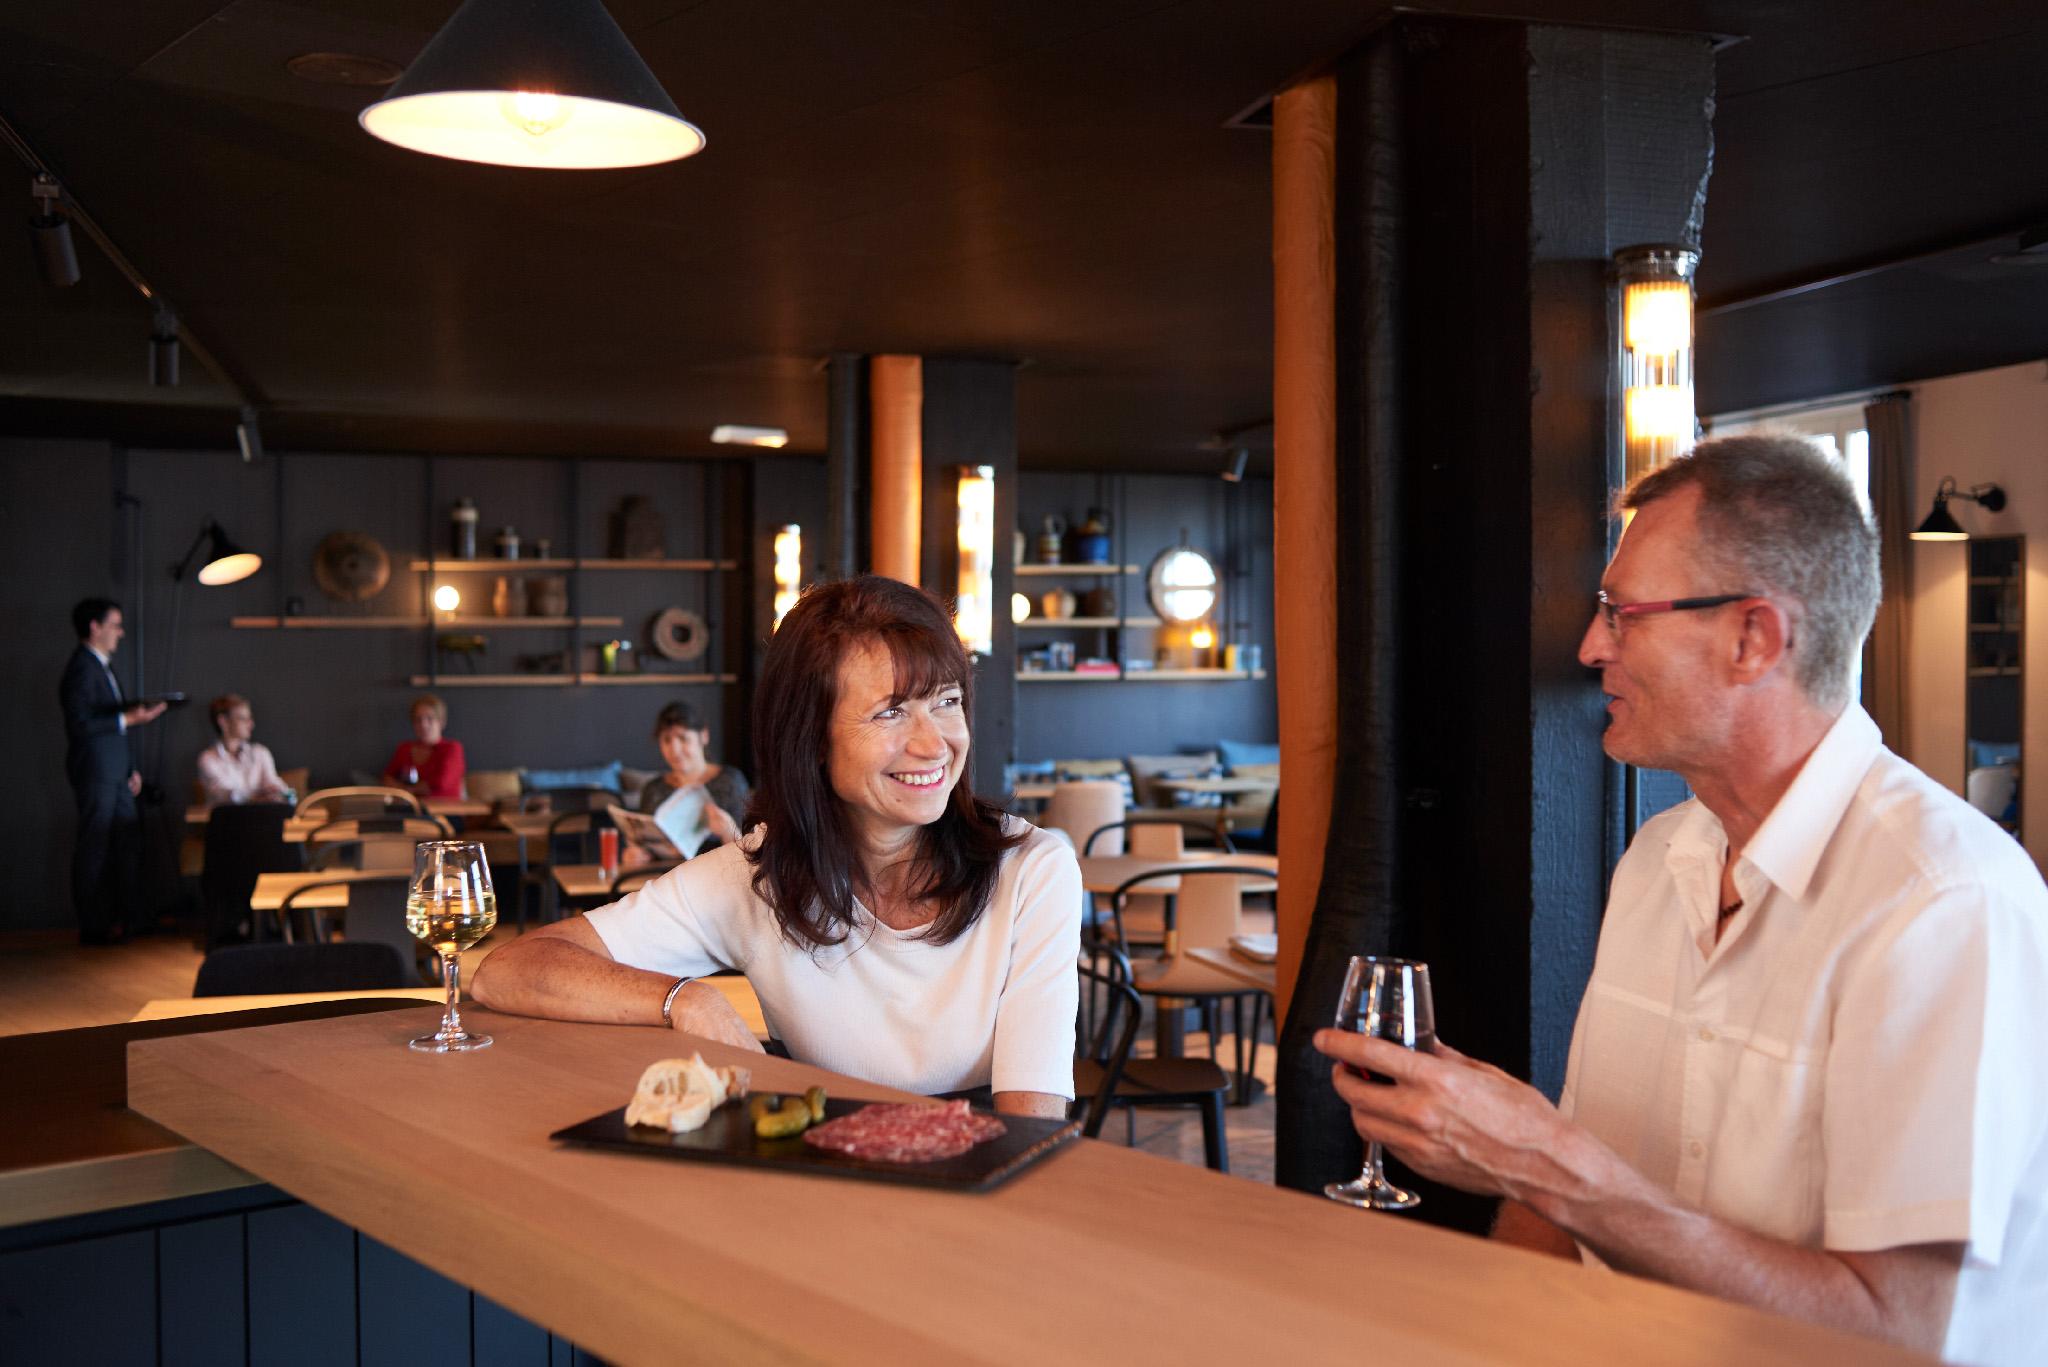 09_photographie_hotel_restaurant_nantes